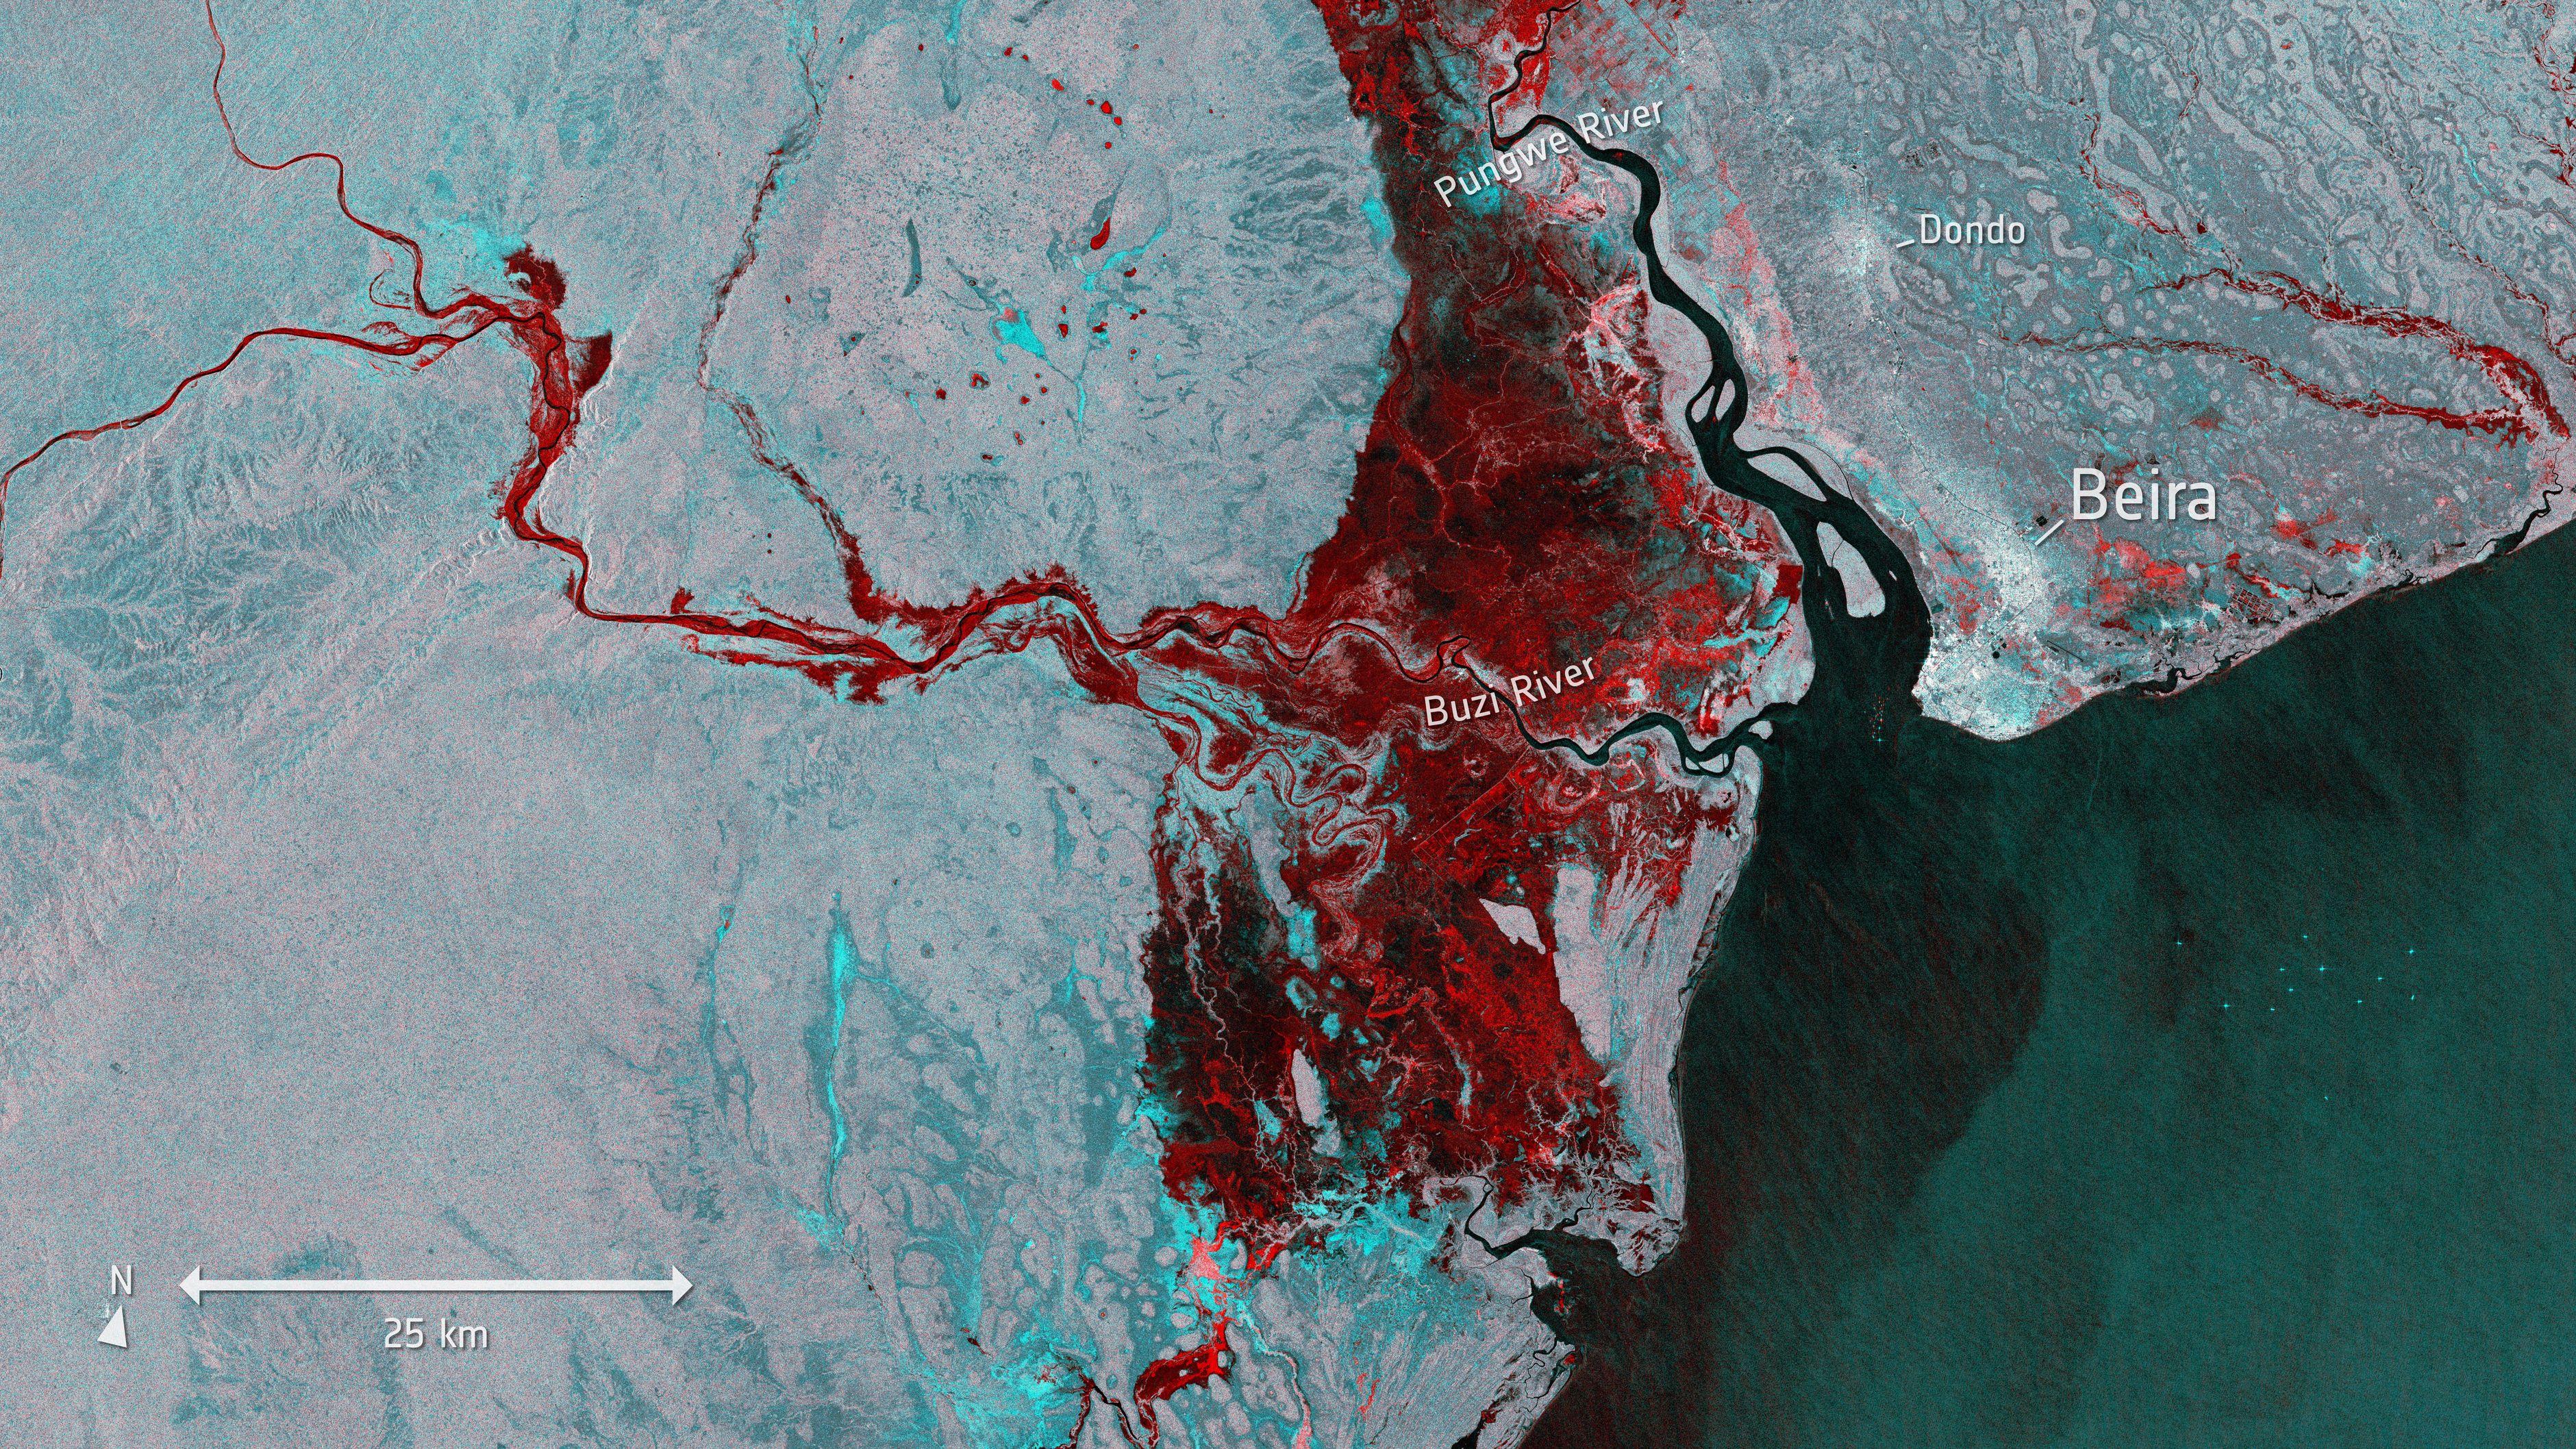 Floods_imaged_by_Copernicus_Sentinel-1.j